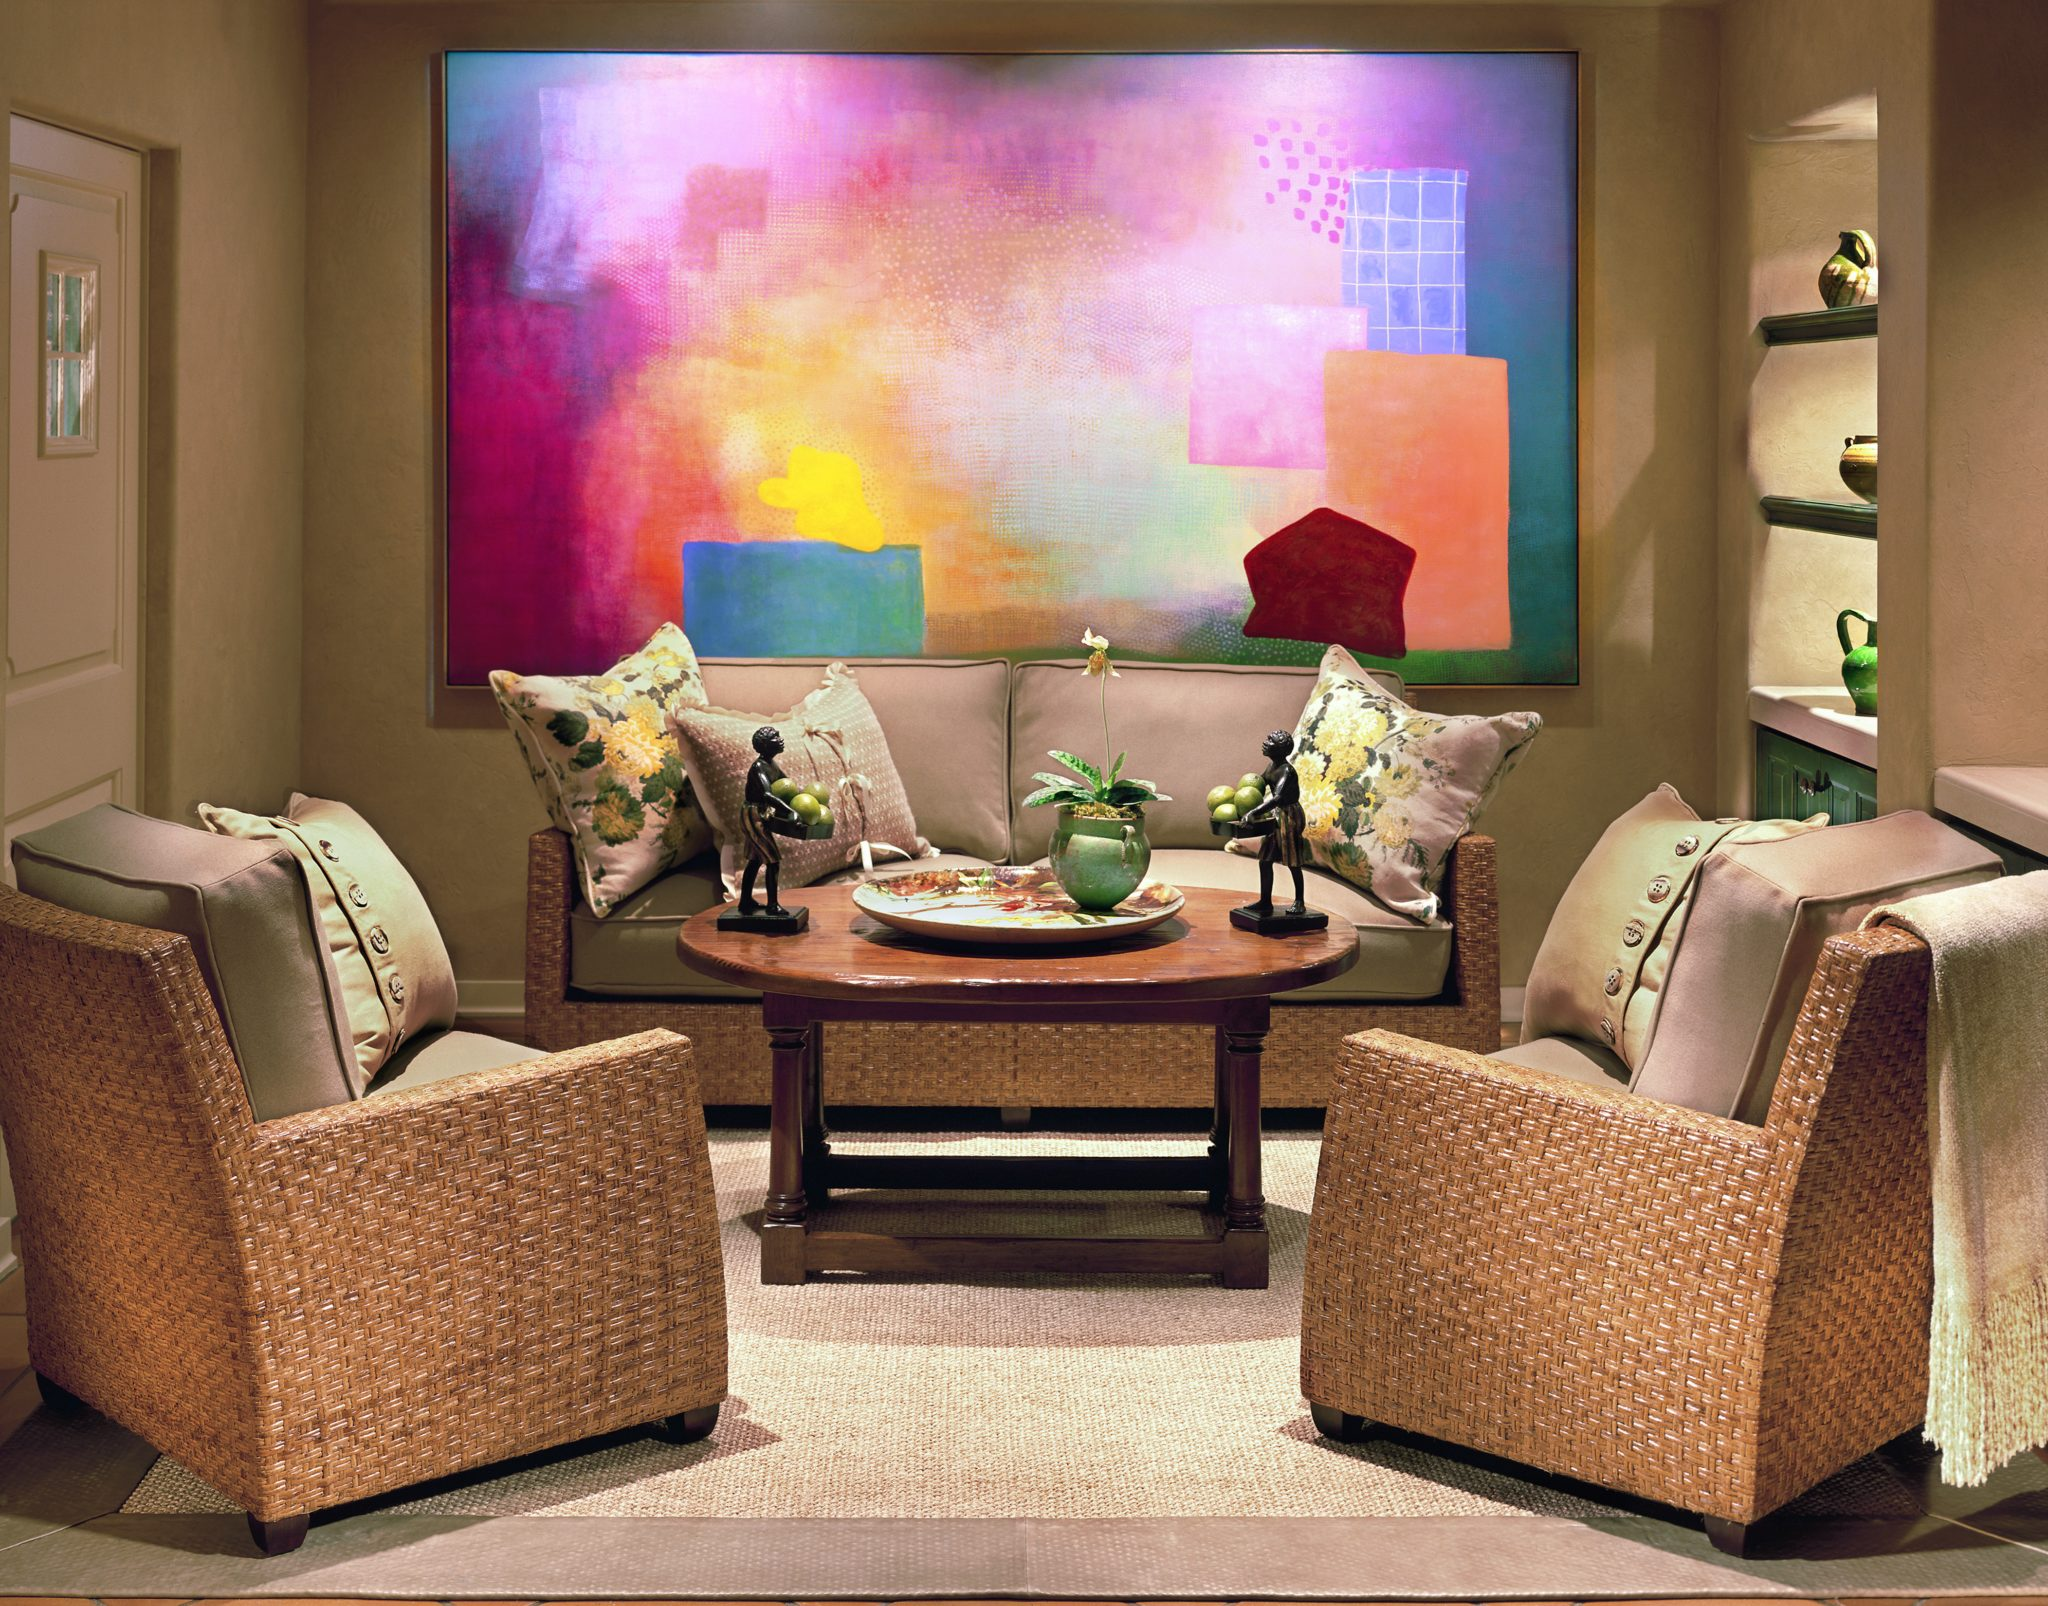 Interior design byBarbara Lee Grigsby Design Associates Inc.